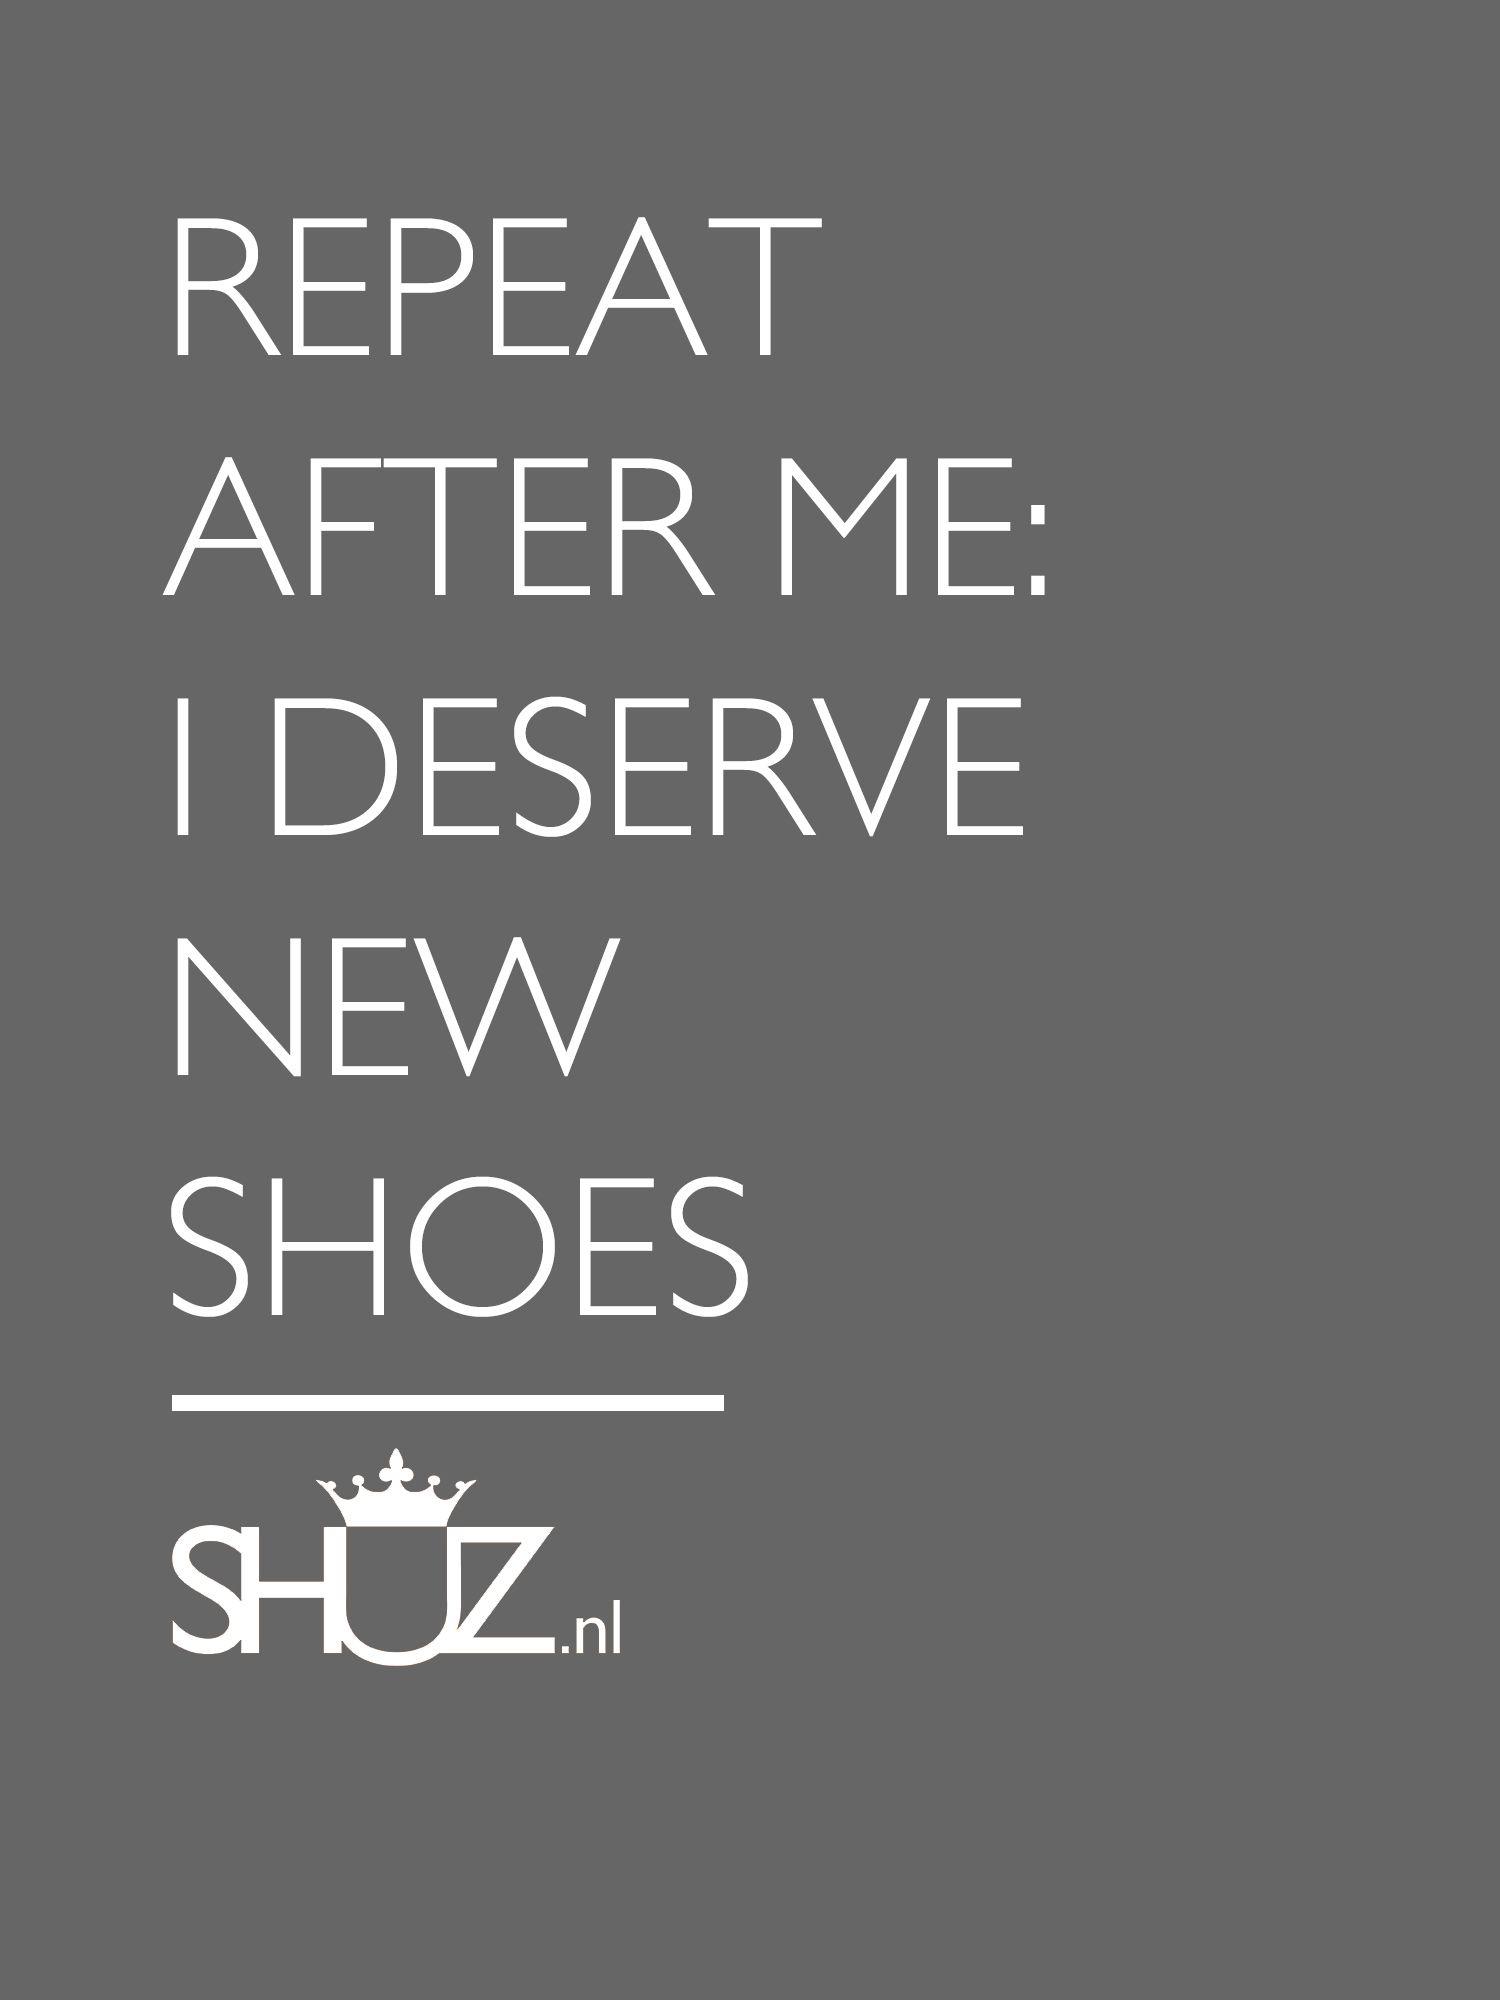 You deserve new shoes!